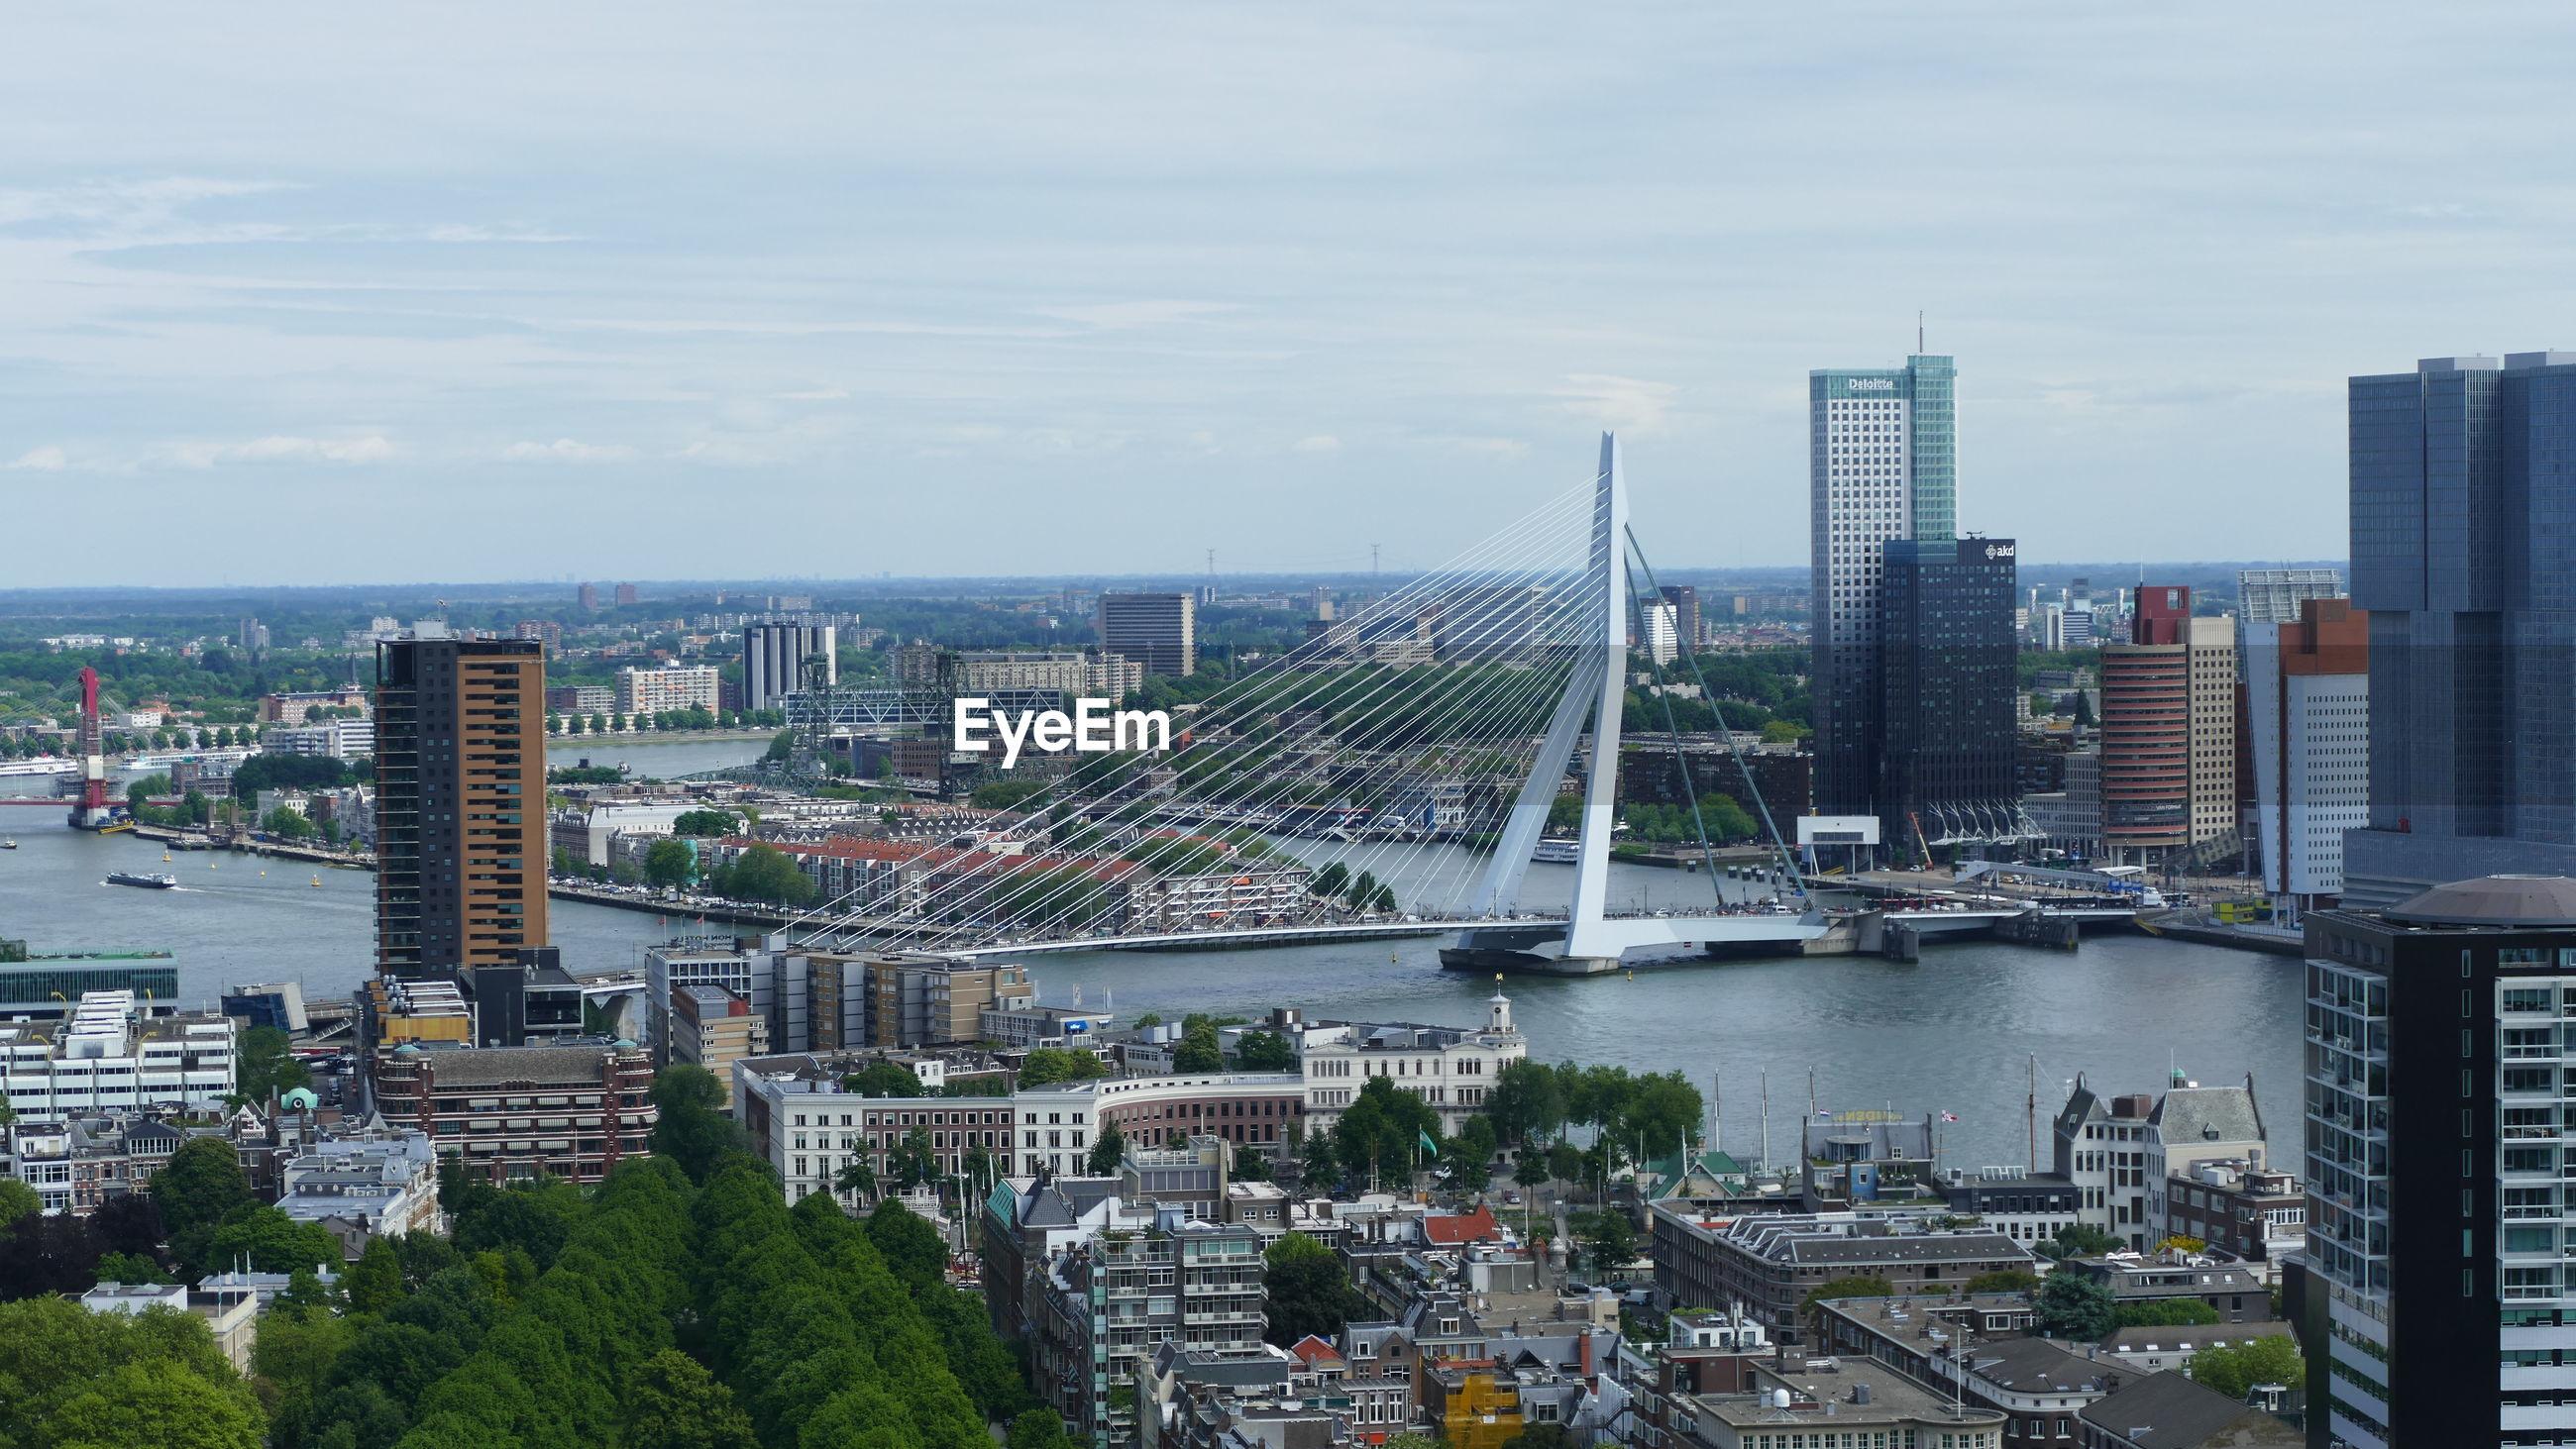 AERIAL VIEW OF BRIDGE AND BUILDINGS IN CITY